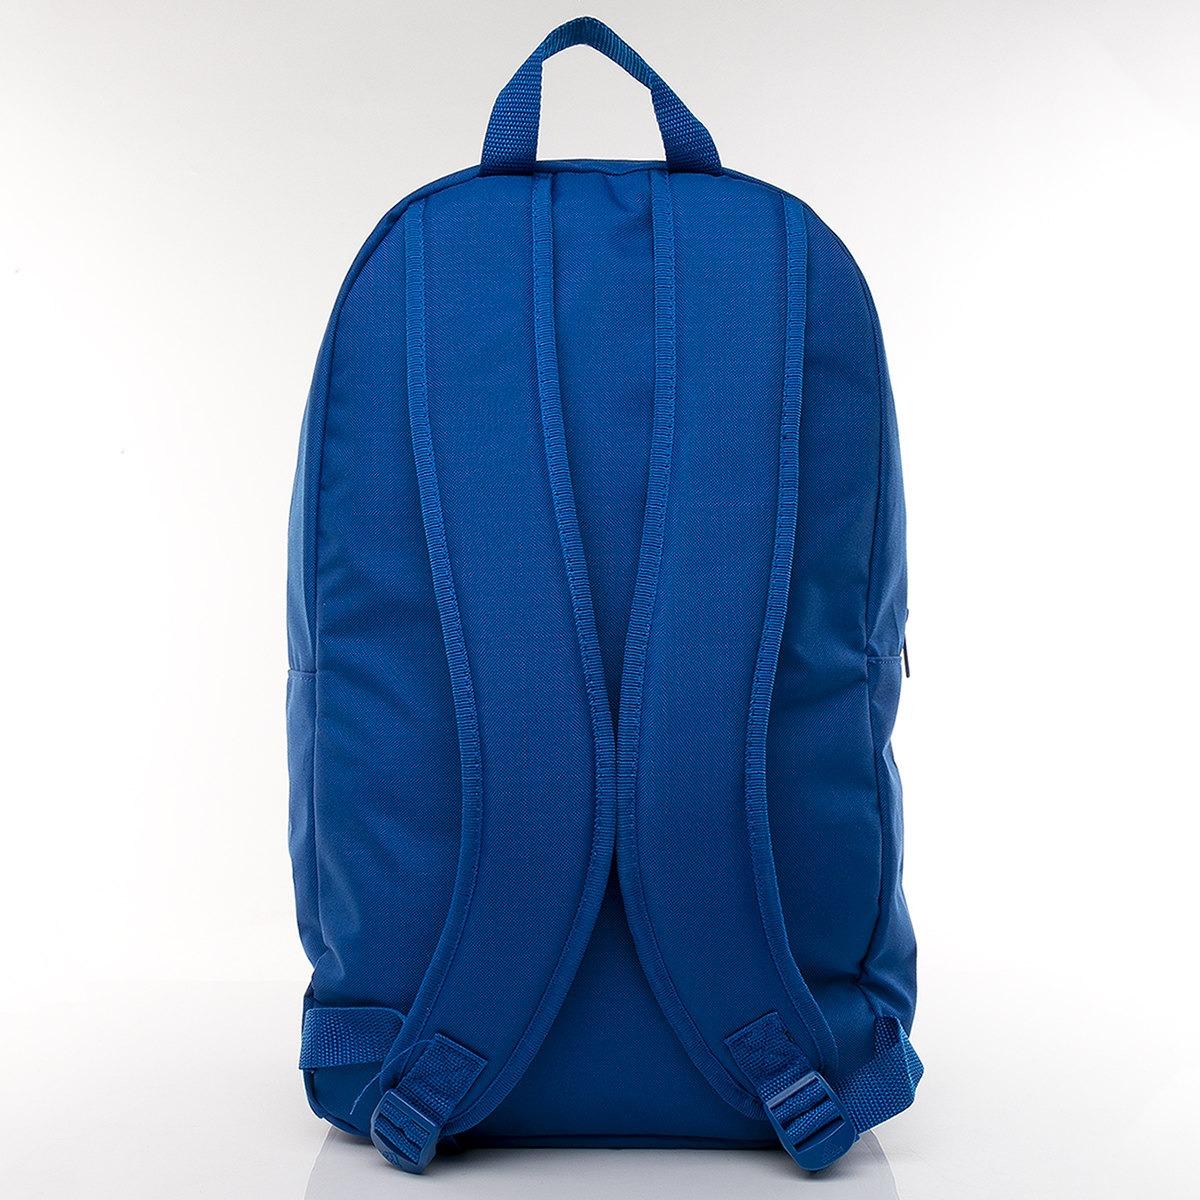 Plain Versatile Azul Mochila Azul Mochila Mochila Versatile Adidas Plain Versatile Adidas DI9H2E